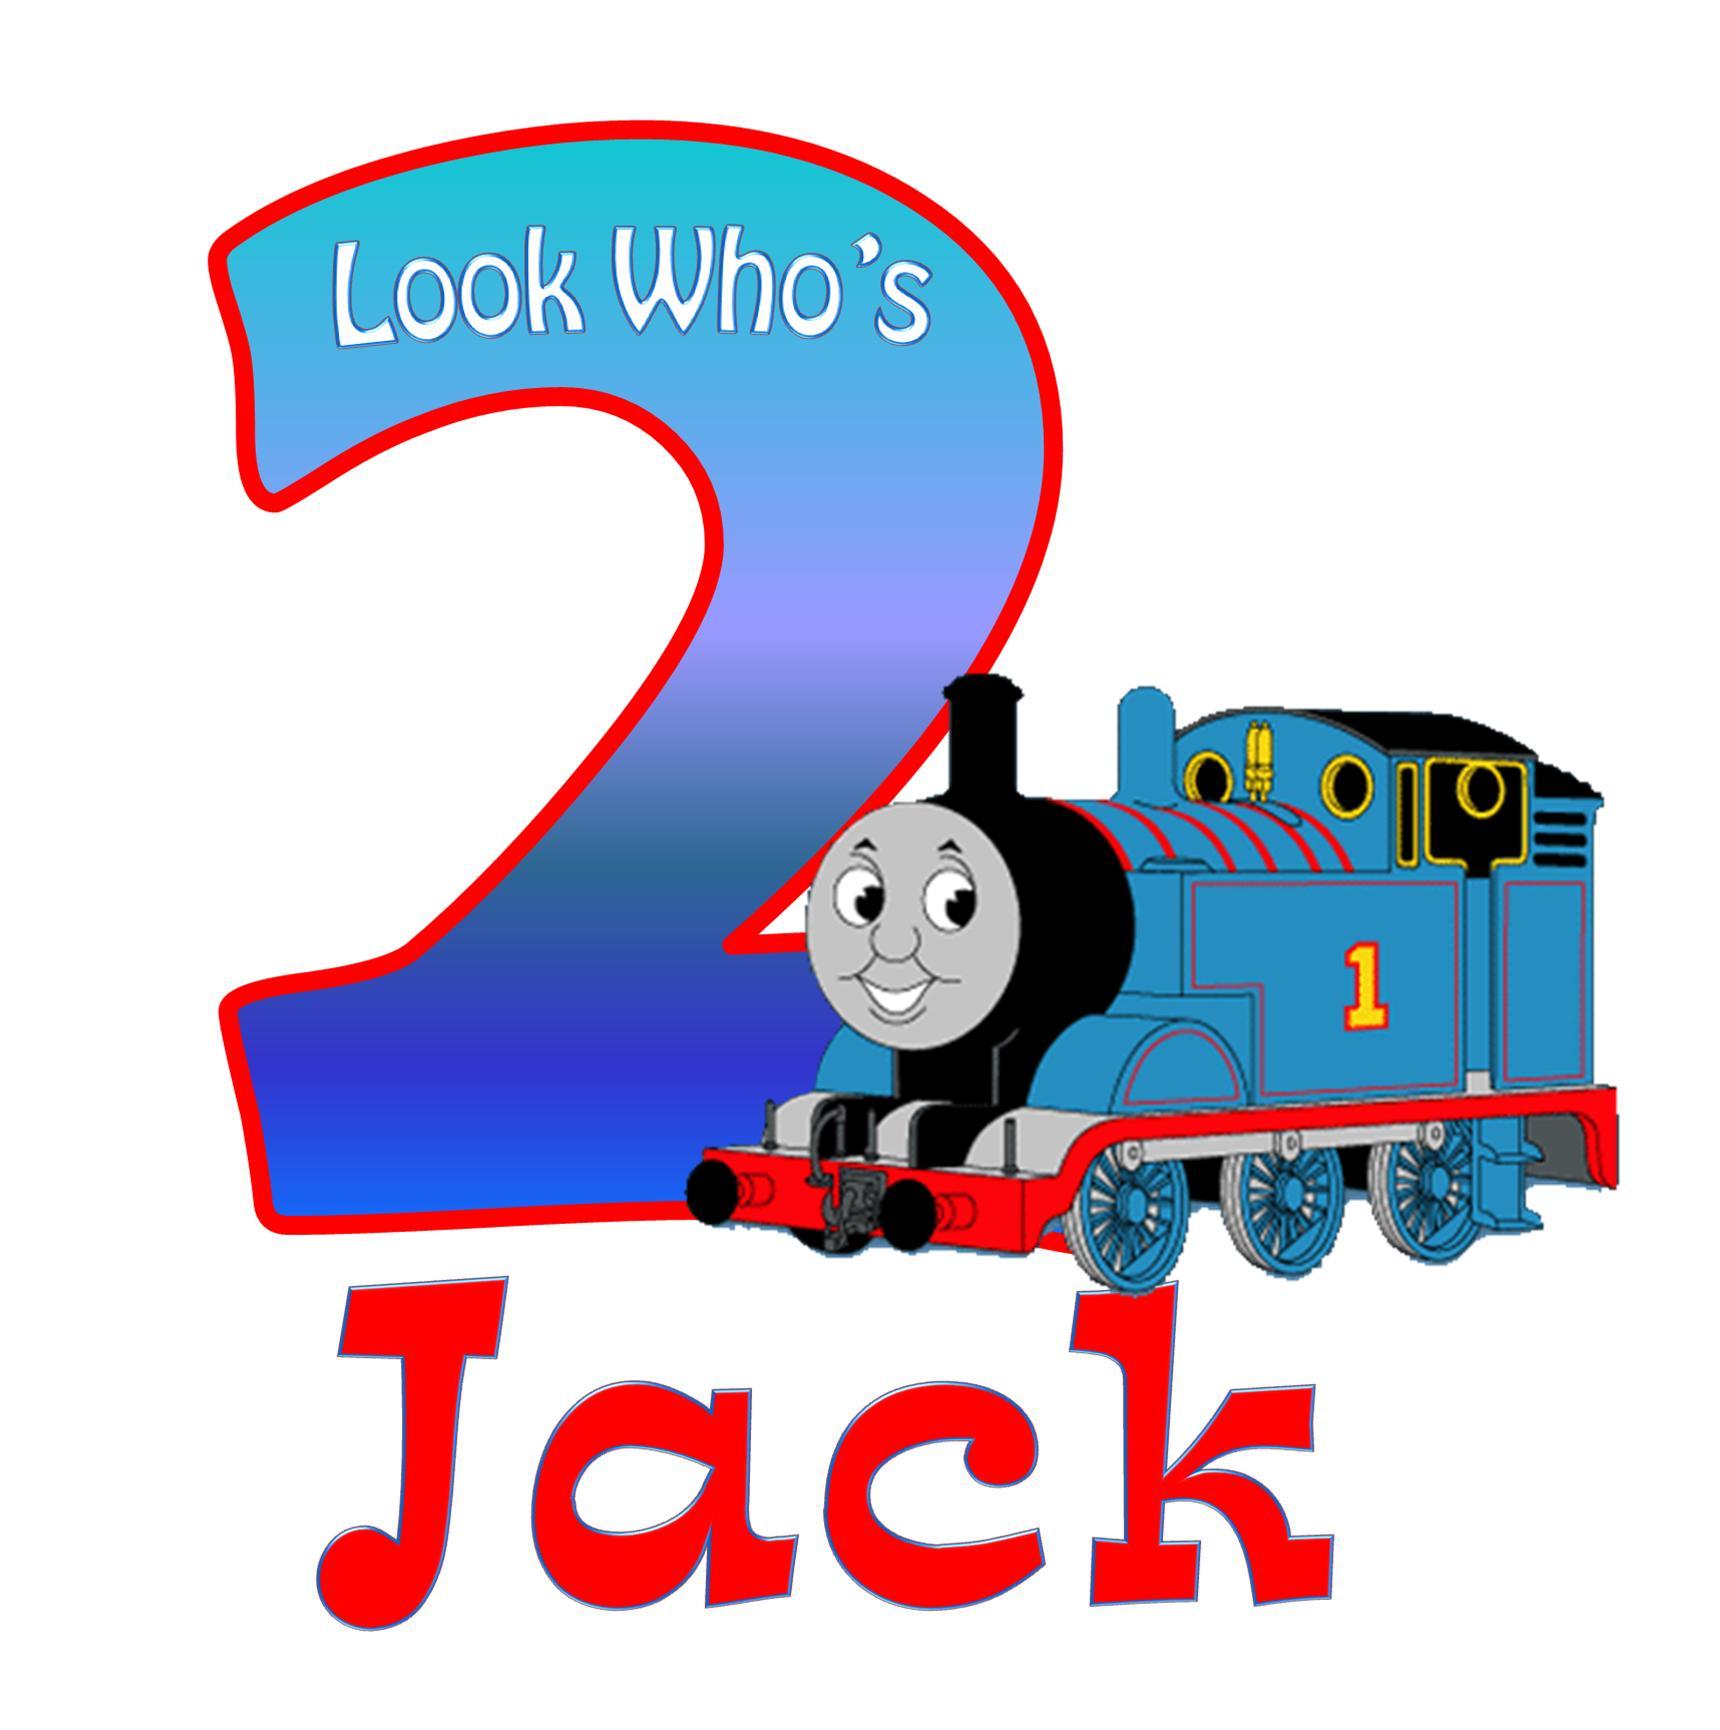 Free Thomas The Train, Download Free Clip Art, Free Clip Art.